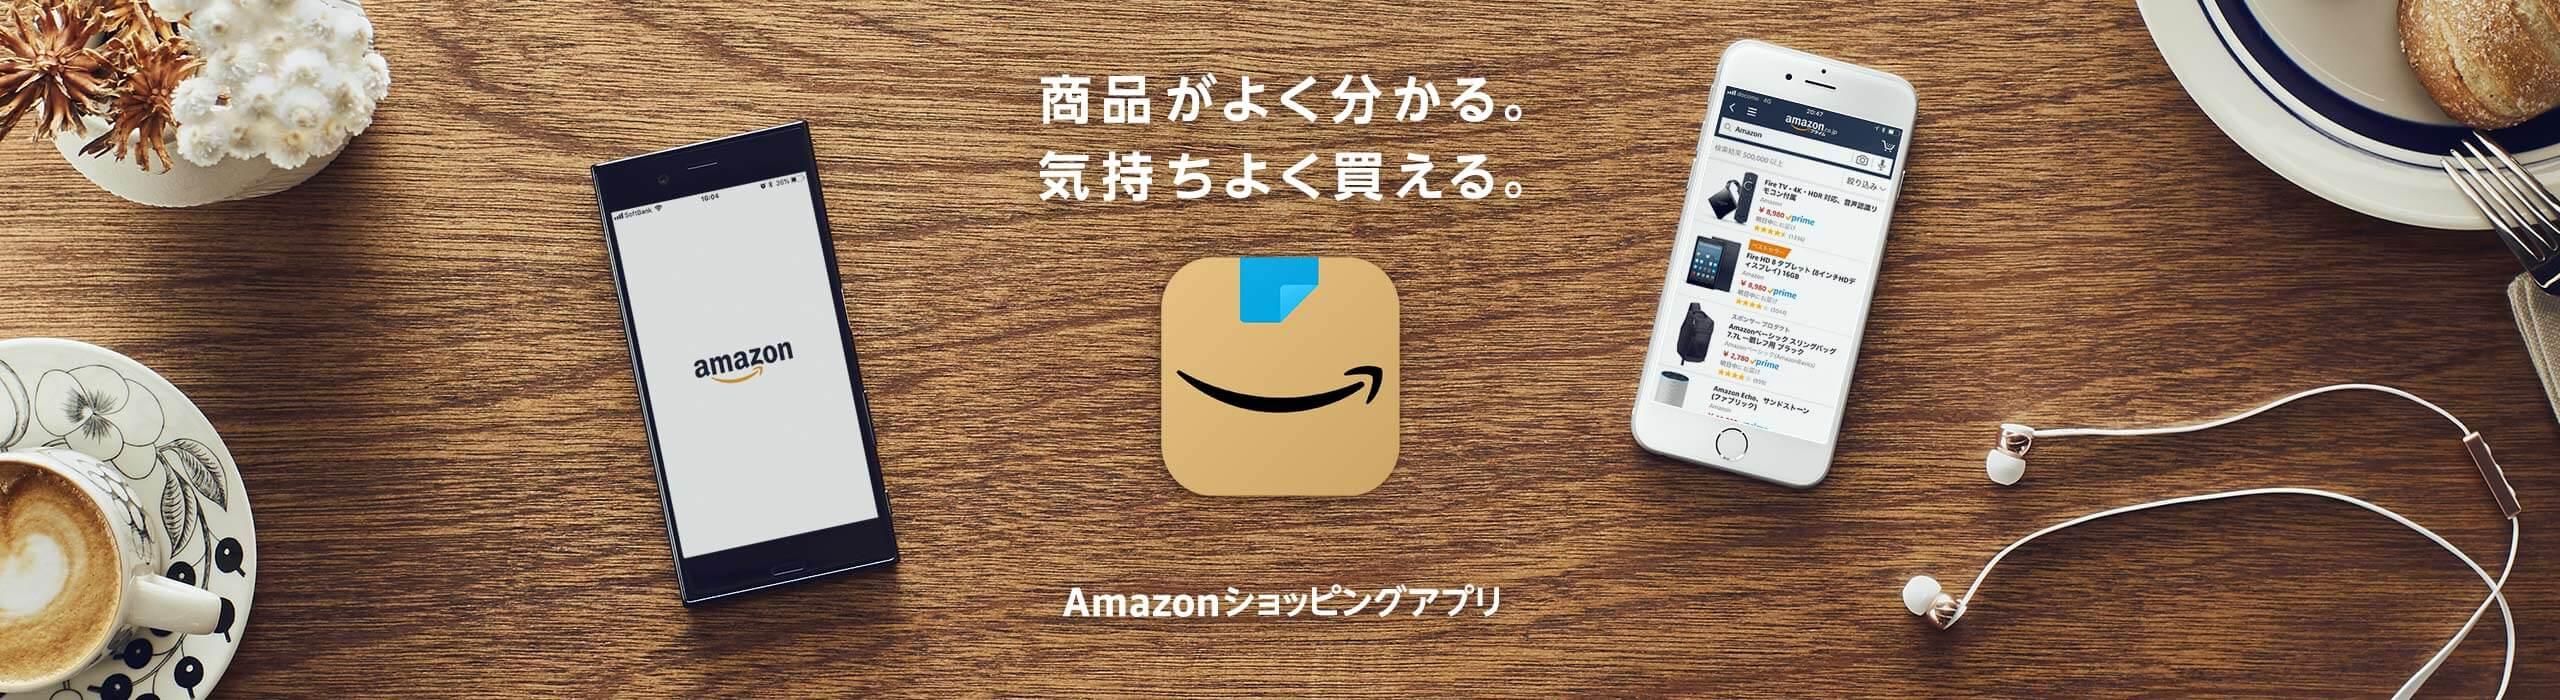 amazon-shopping-application